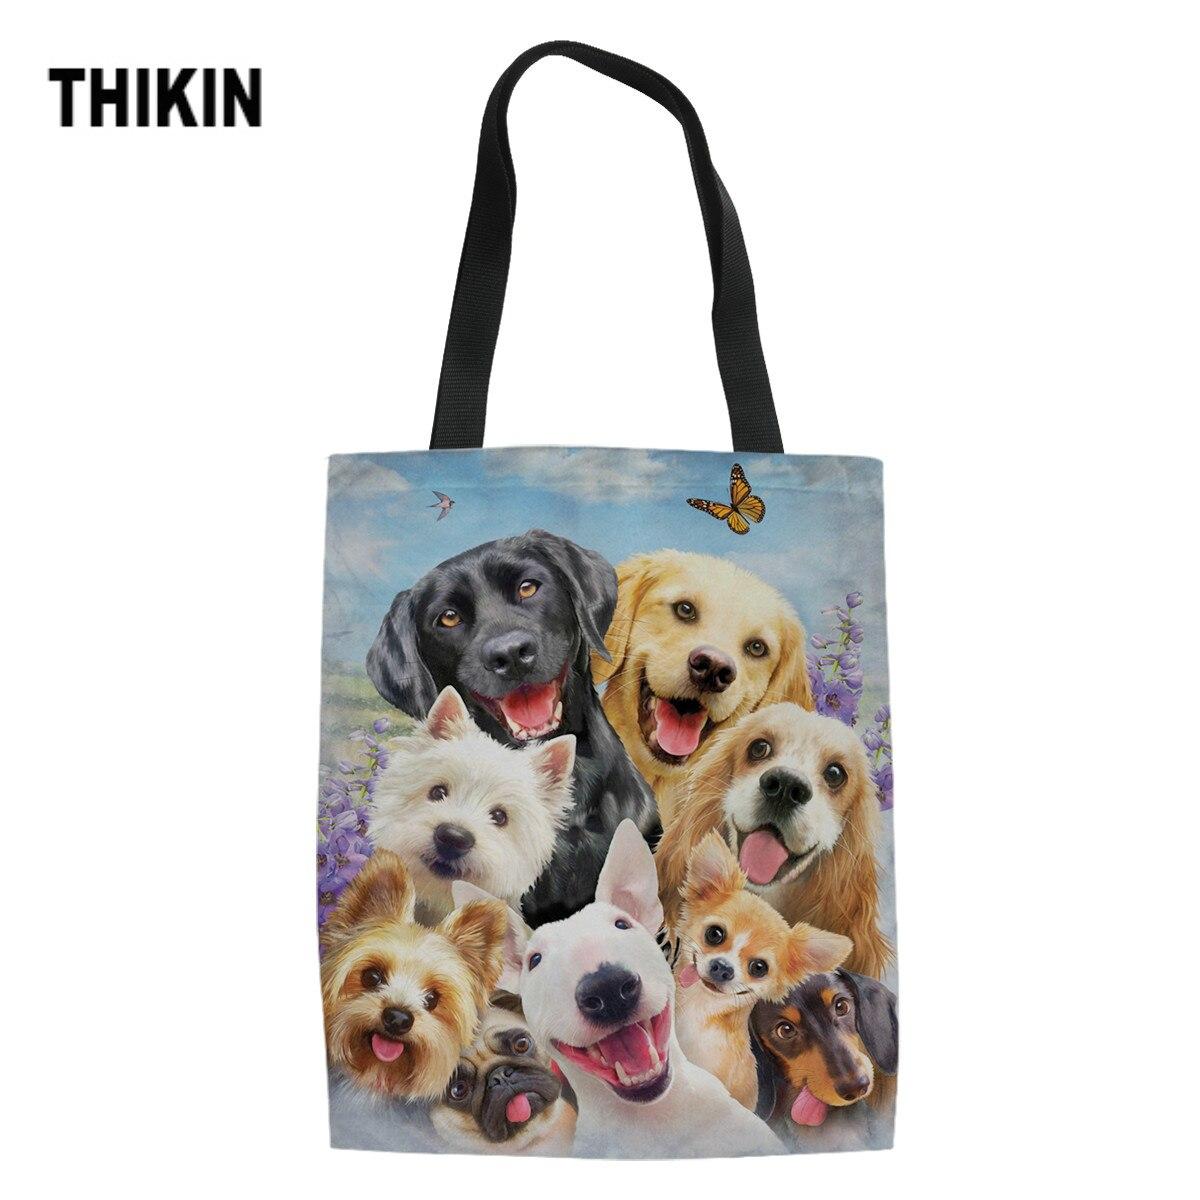 THIKIN Cute Pug Golden Retriever Labrador Cartoon Dogs Print Shopping Bags For Girls Women Tote Bag Ladies Canvas Handbag Custom